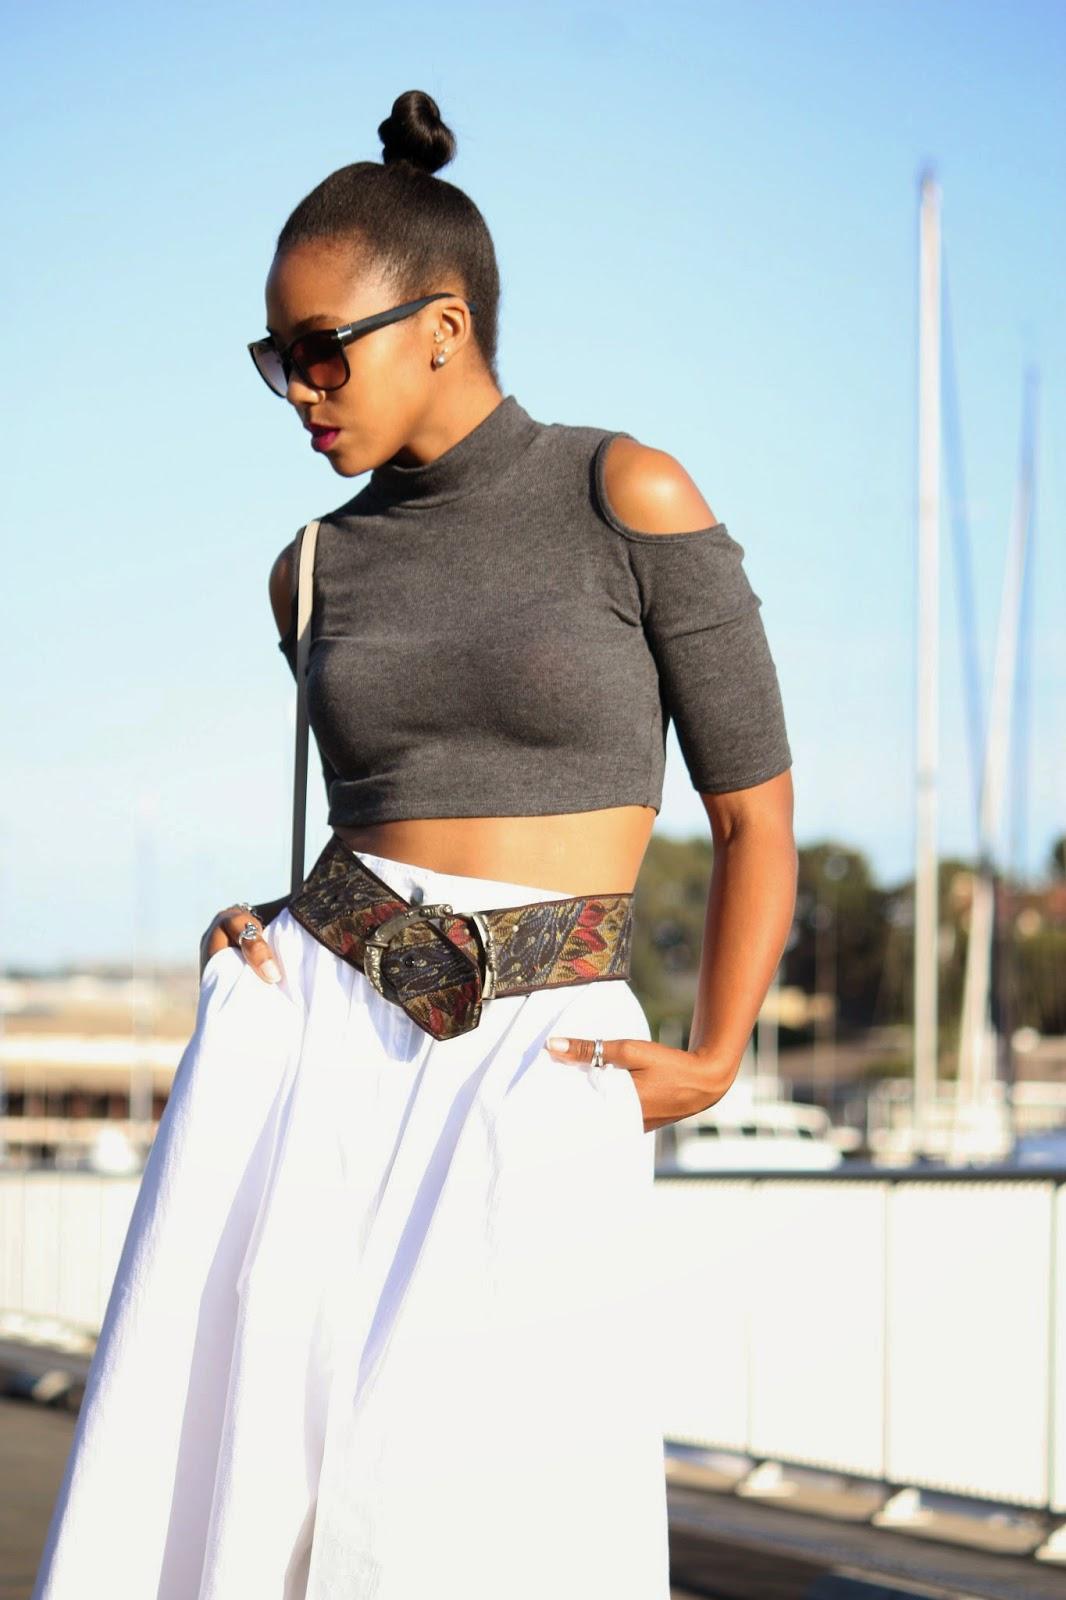 Wearing: H&M sunglasses M.A.C Rebel lipstick Kate Spade New York bag Tiffany & Co earrings and bracelet